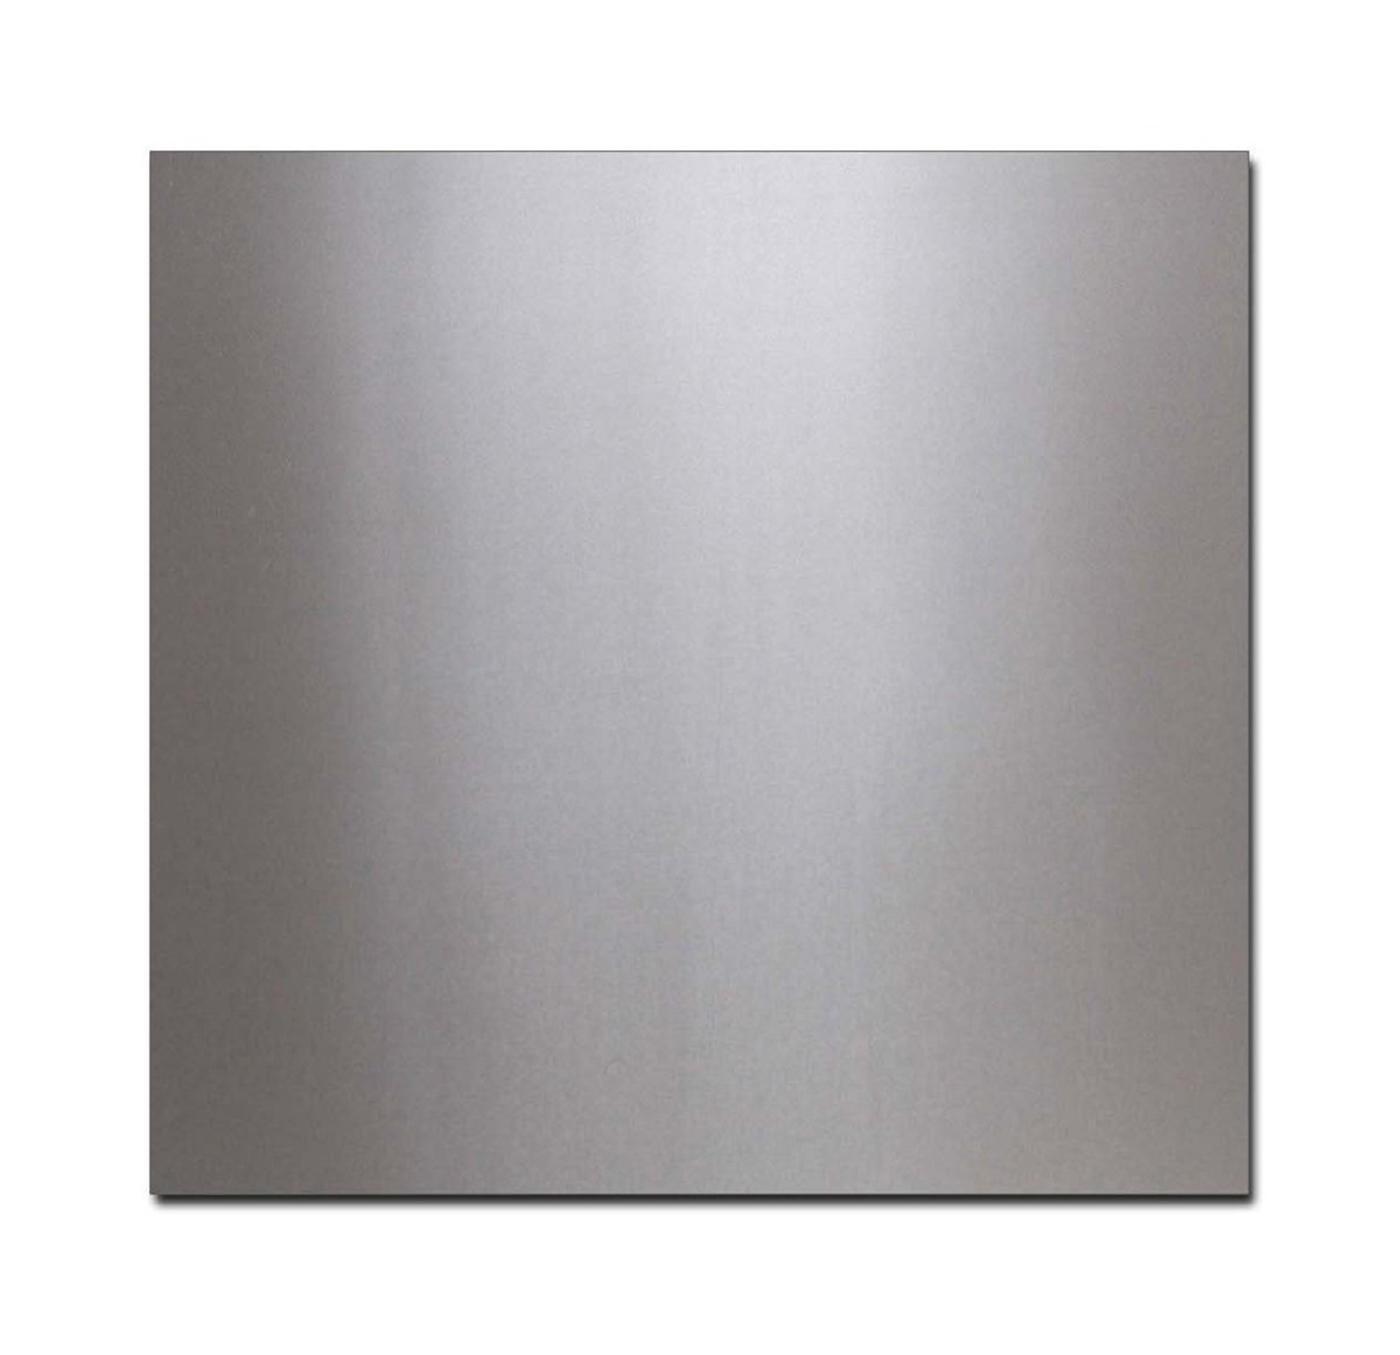 - Amazon.com: KOBE SSP36 36-Inch Stainless Steel Backsplash Panel